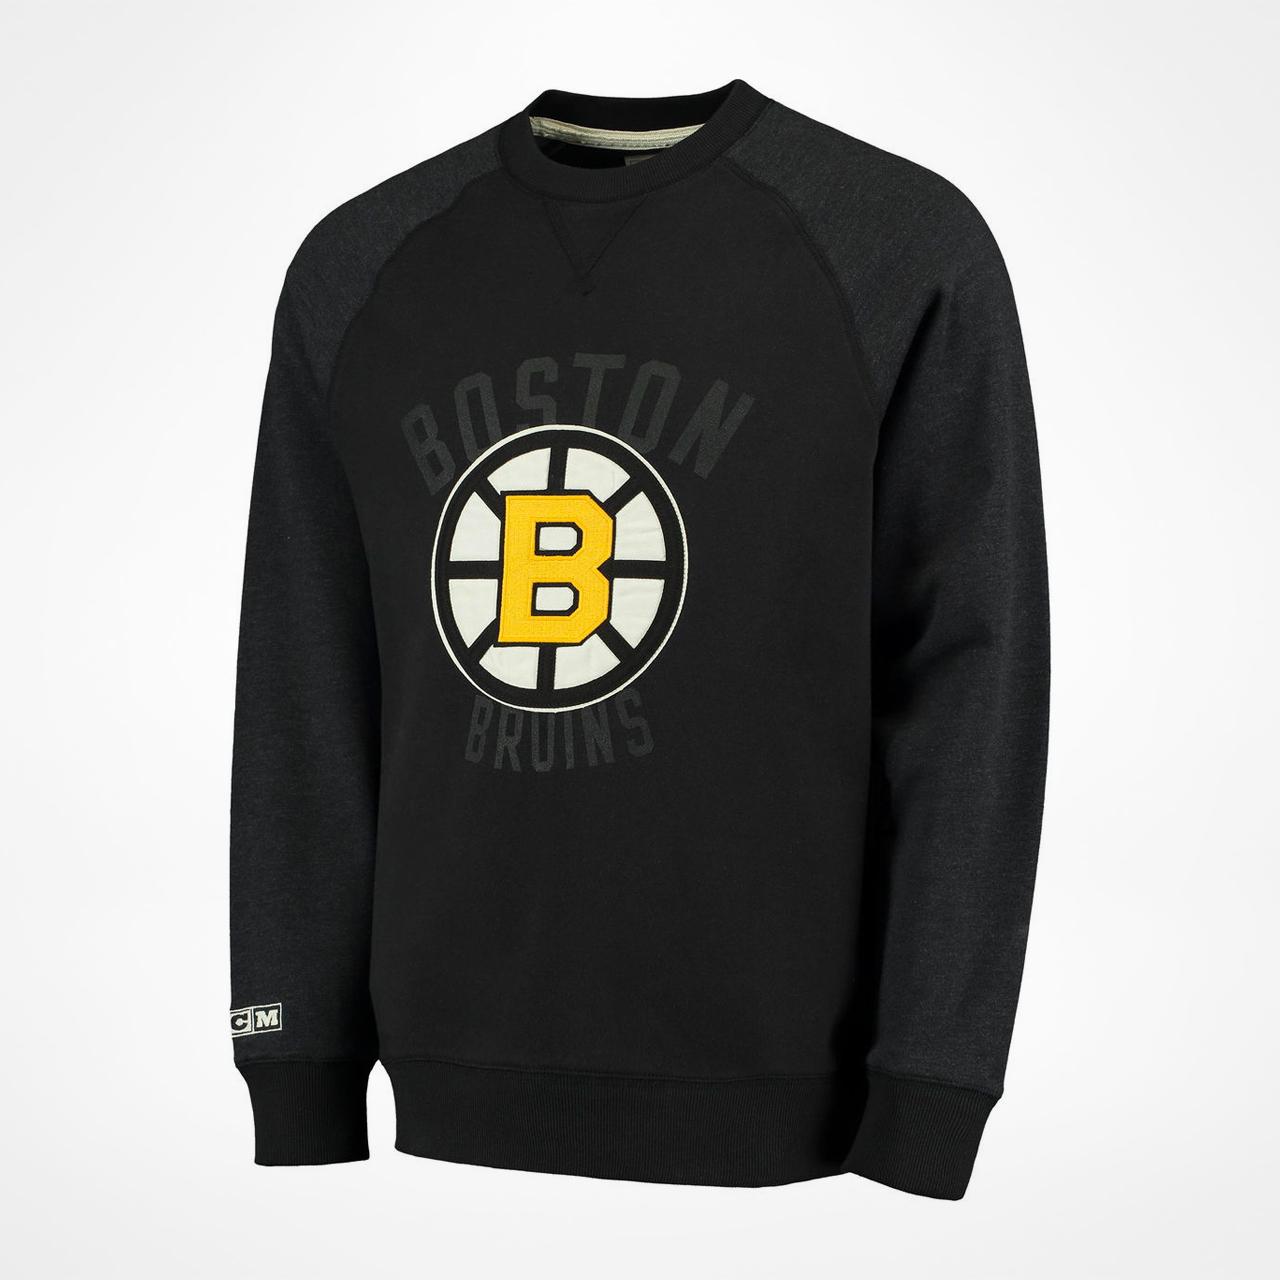 Boston Bruins Sweatshirt Crew - SupportersPlace